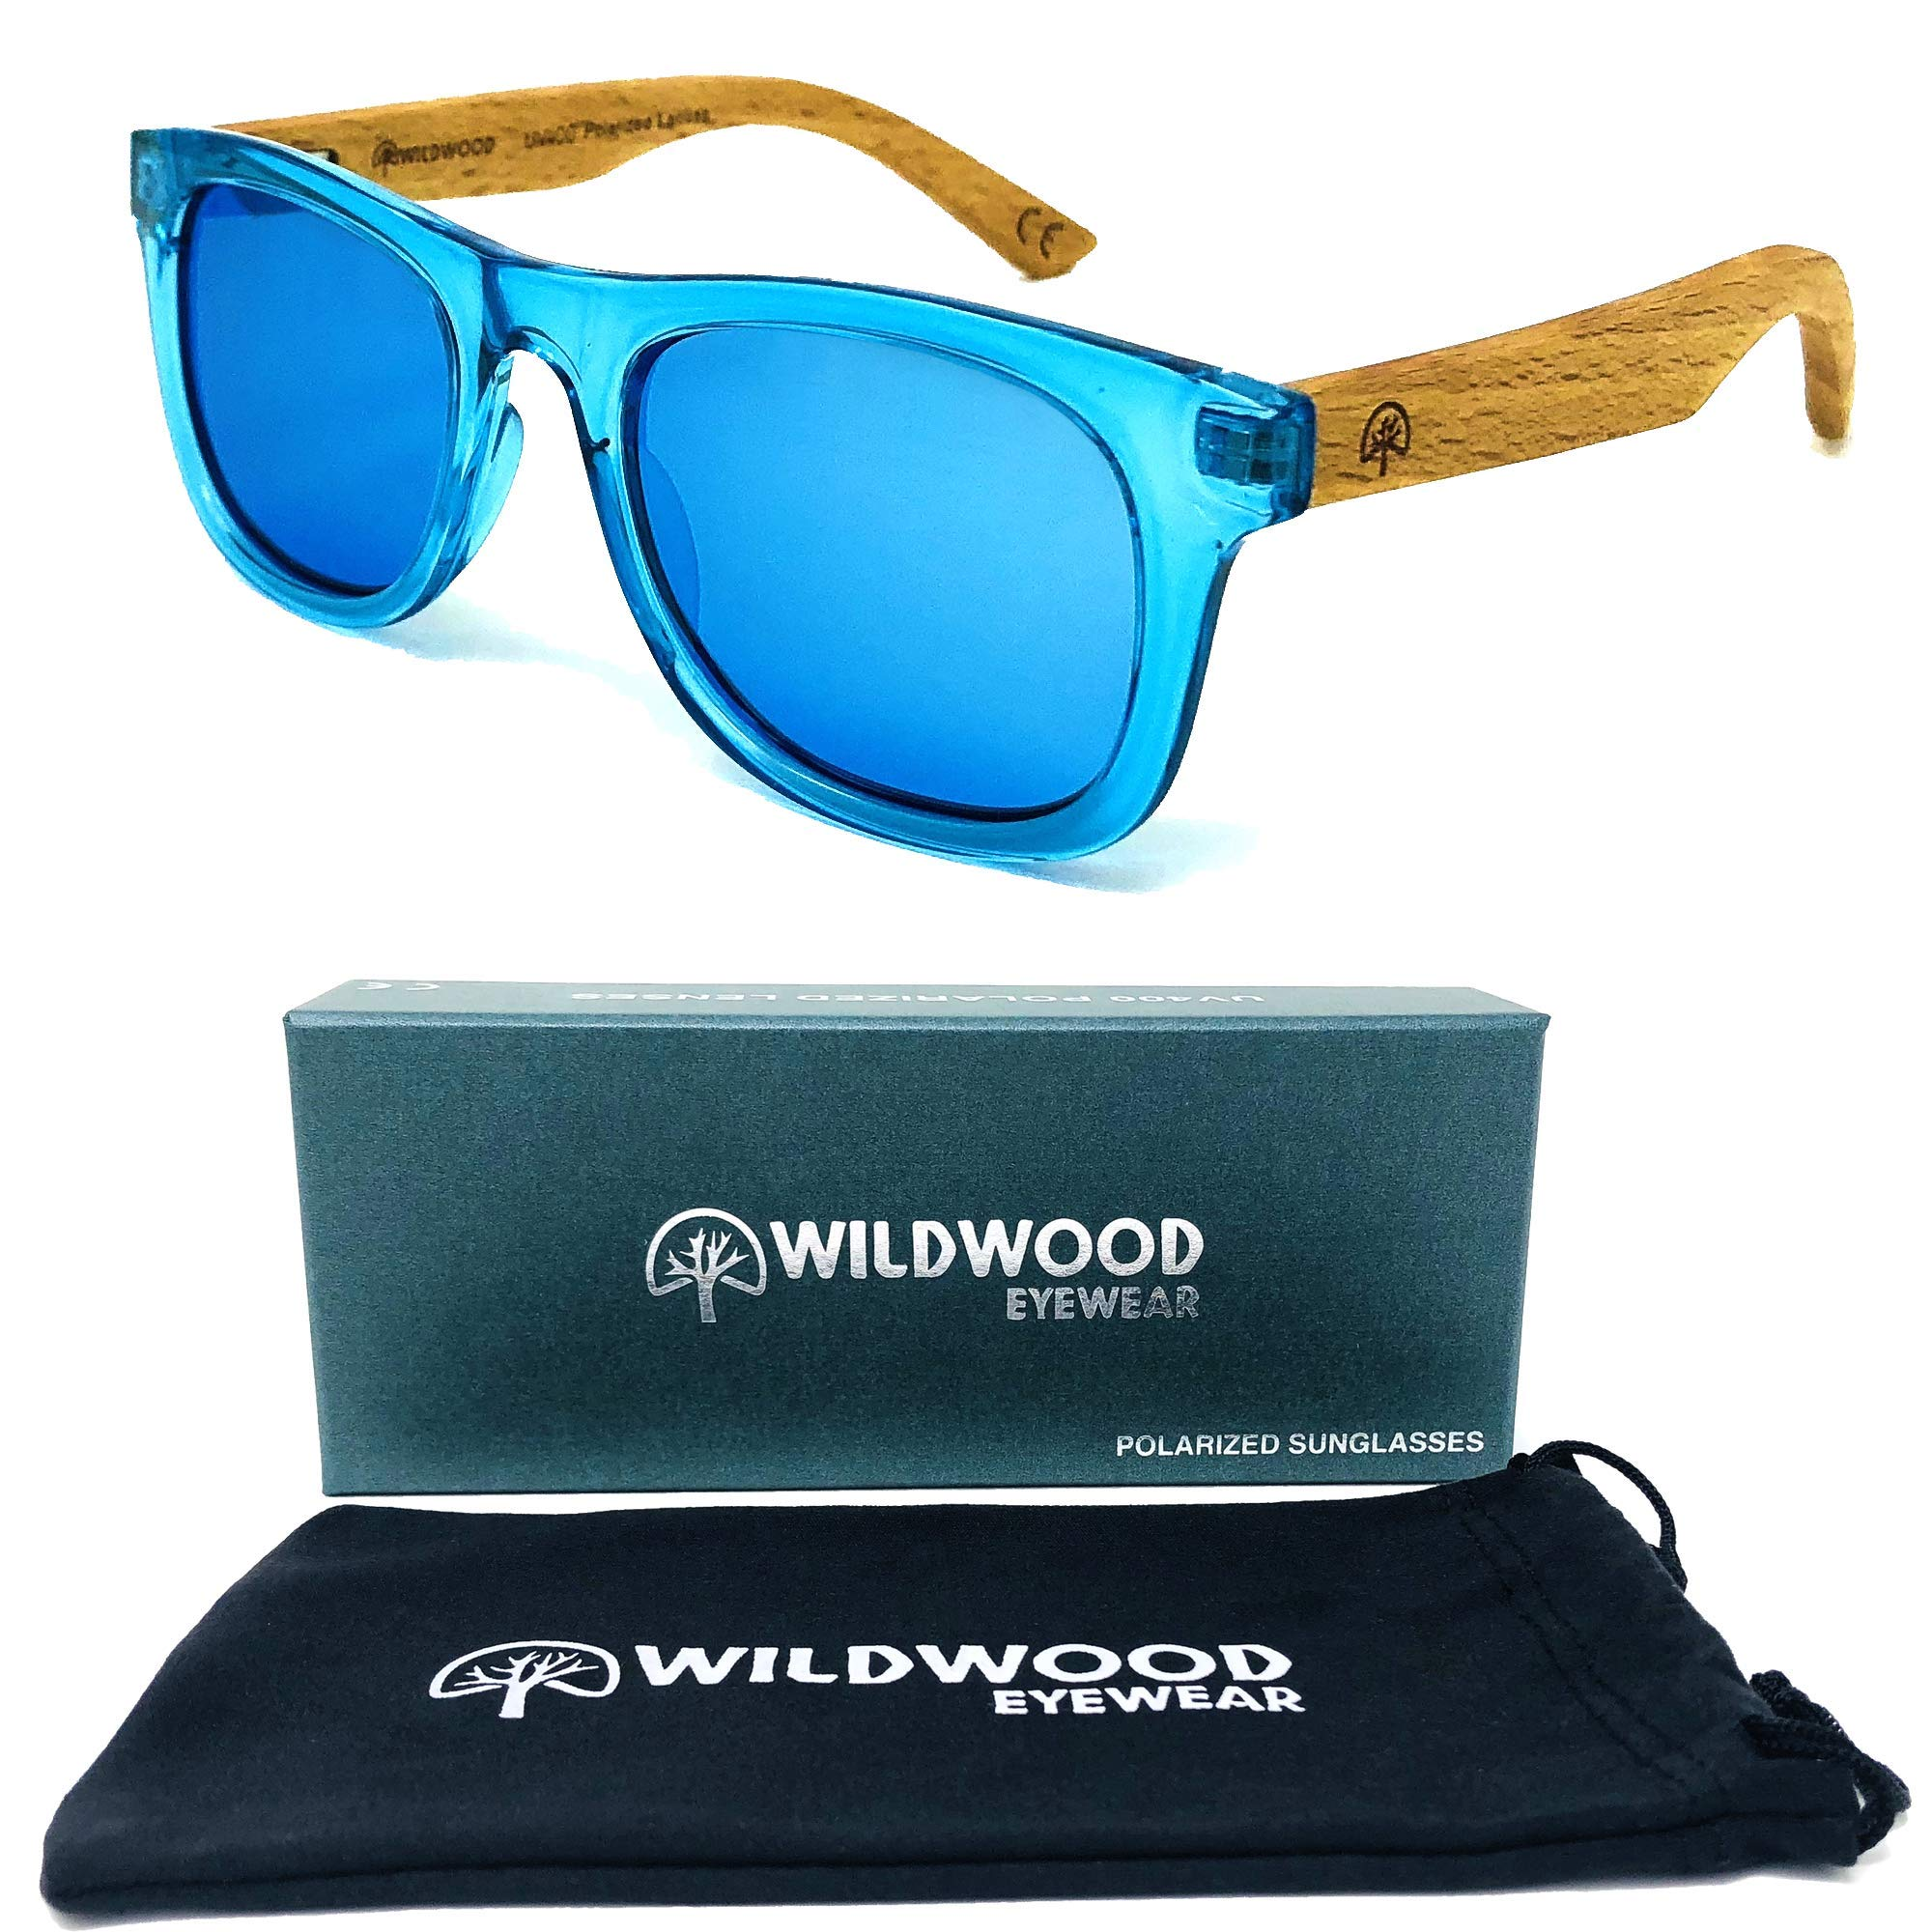 Wildwood Kids Wayfarer Polarized Sunglasses (Ages 4-8) (Blue)